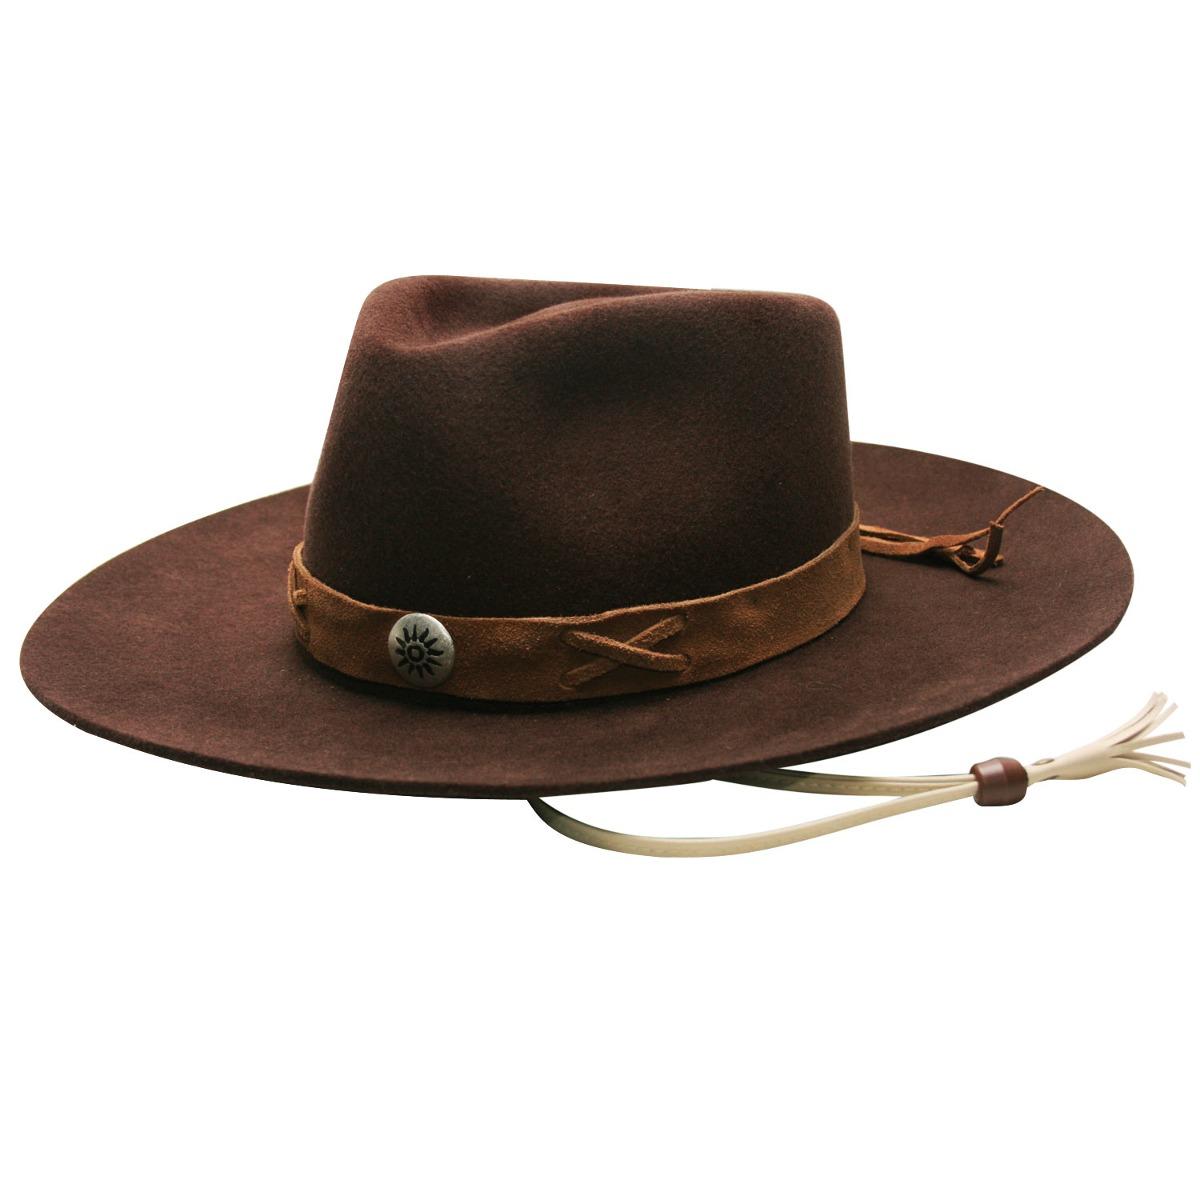 chapéu classic laçador ii -marrom-tamanho 60. Carregando zoom. c8f78789b8e